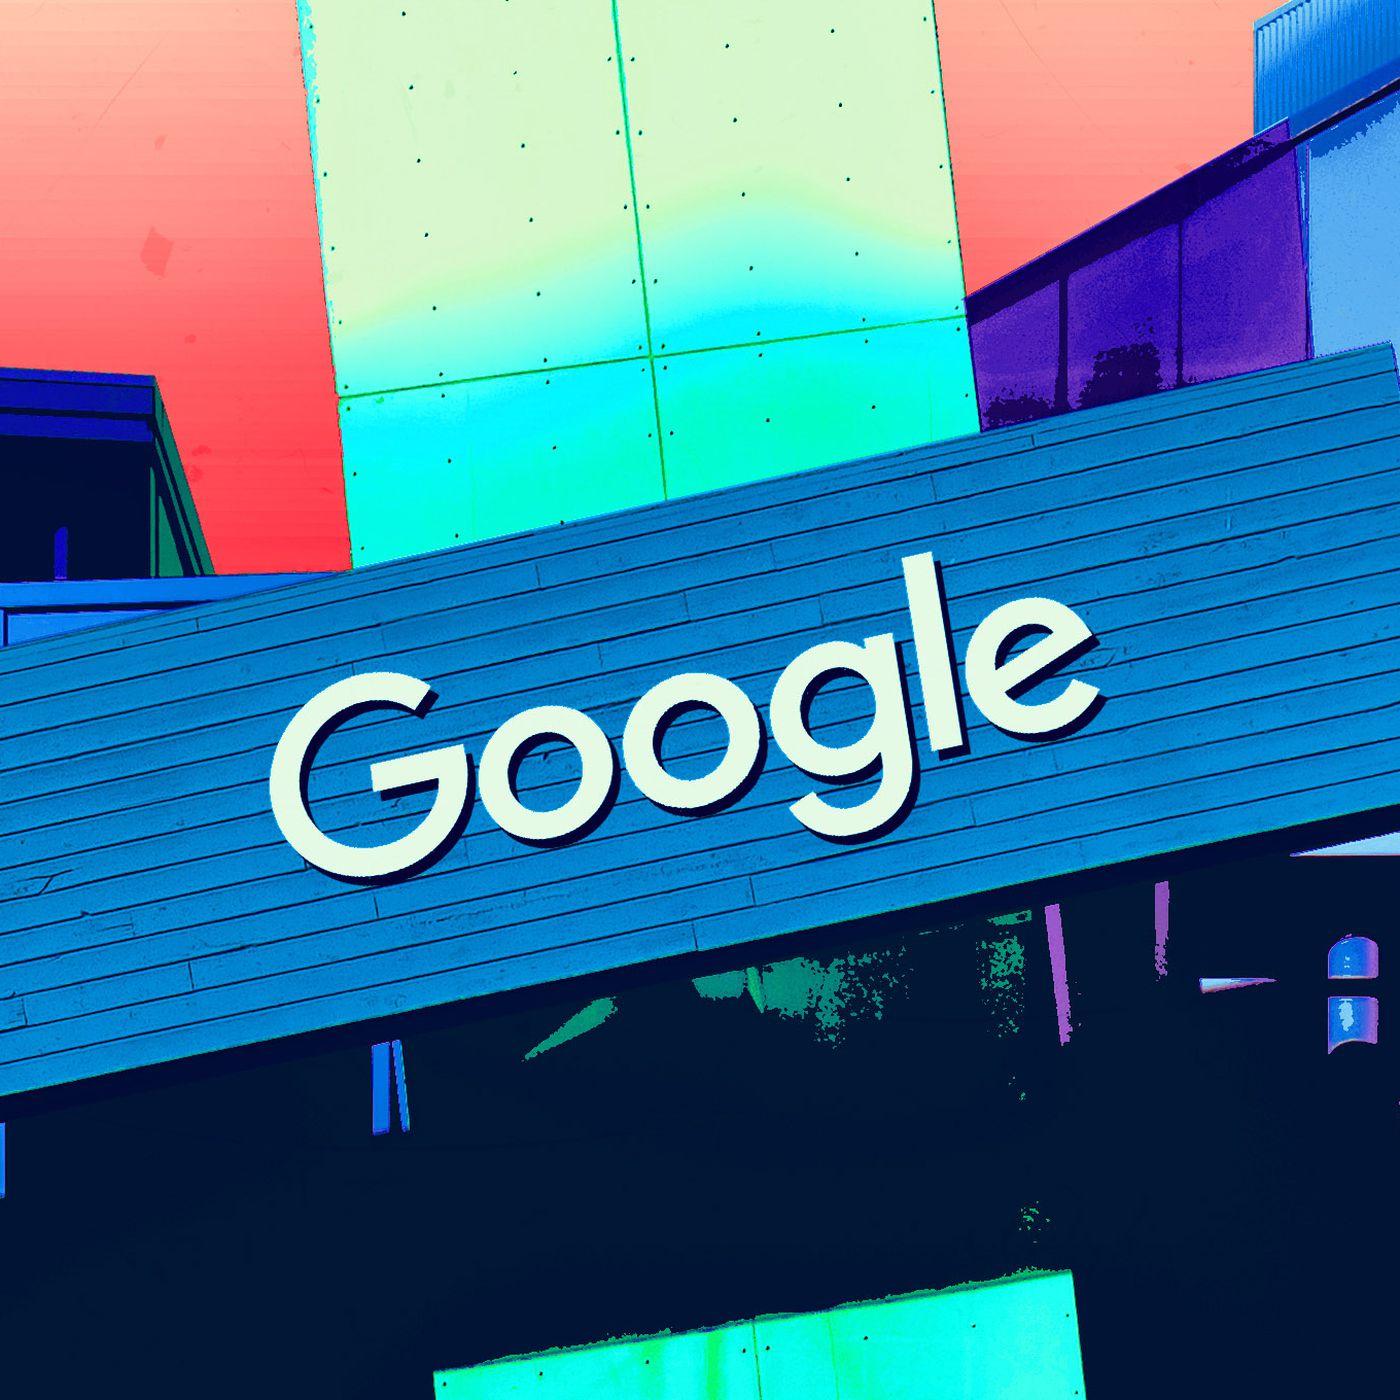 Google still exploiting tax loopholes to shelter billions in